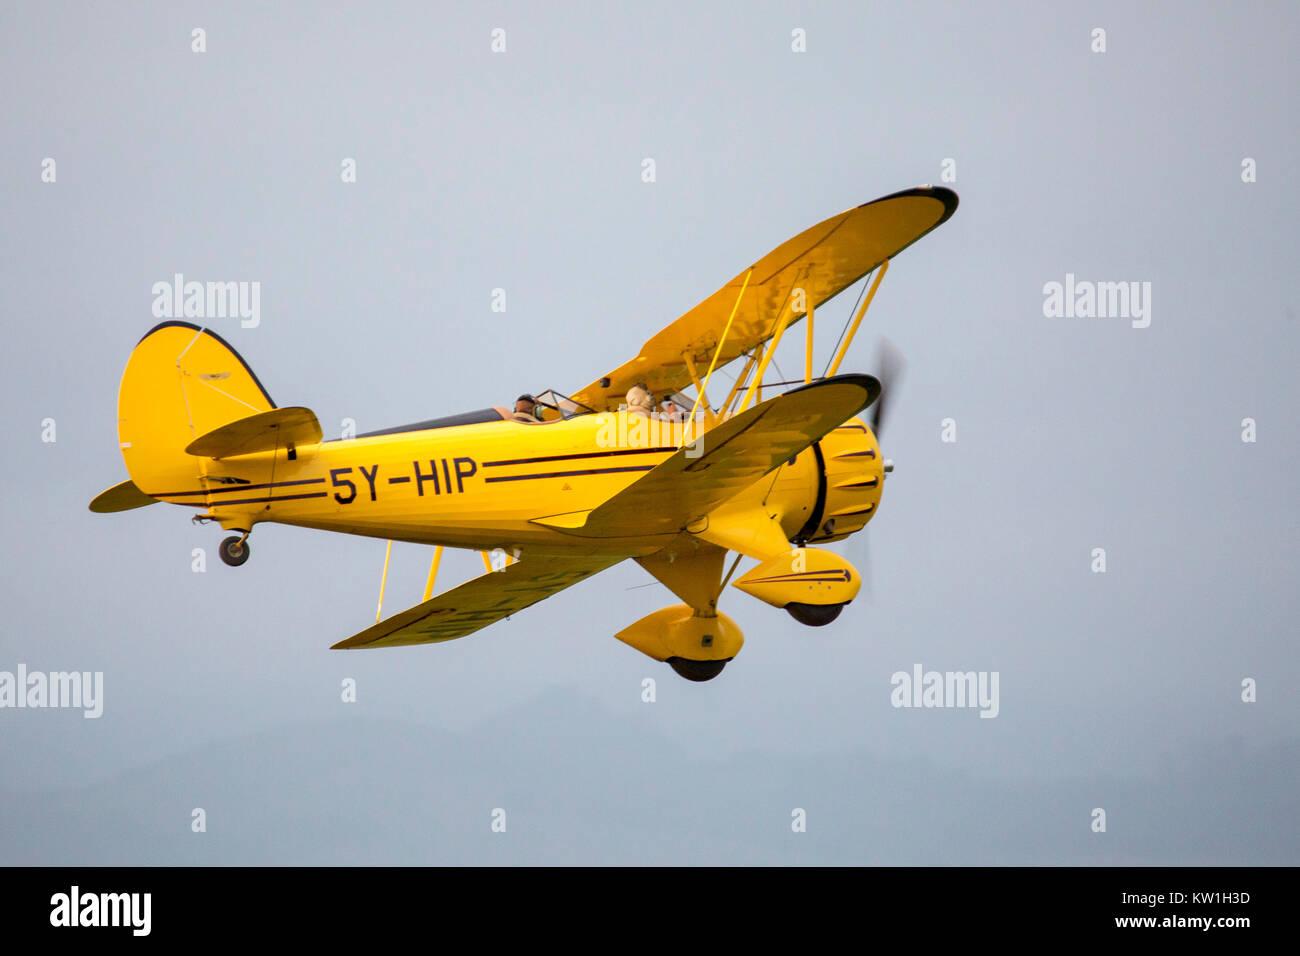 A 1930's Waco biplane flying at dawn over Laikipia, very close view,  Lewa Wilderness,Lewa Conservancy, Kenya, - Stock Image